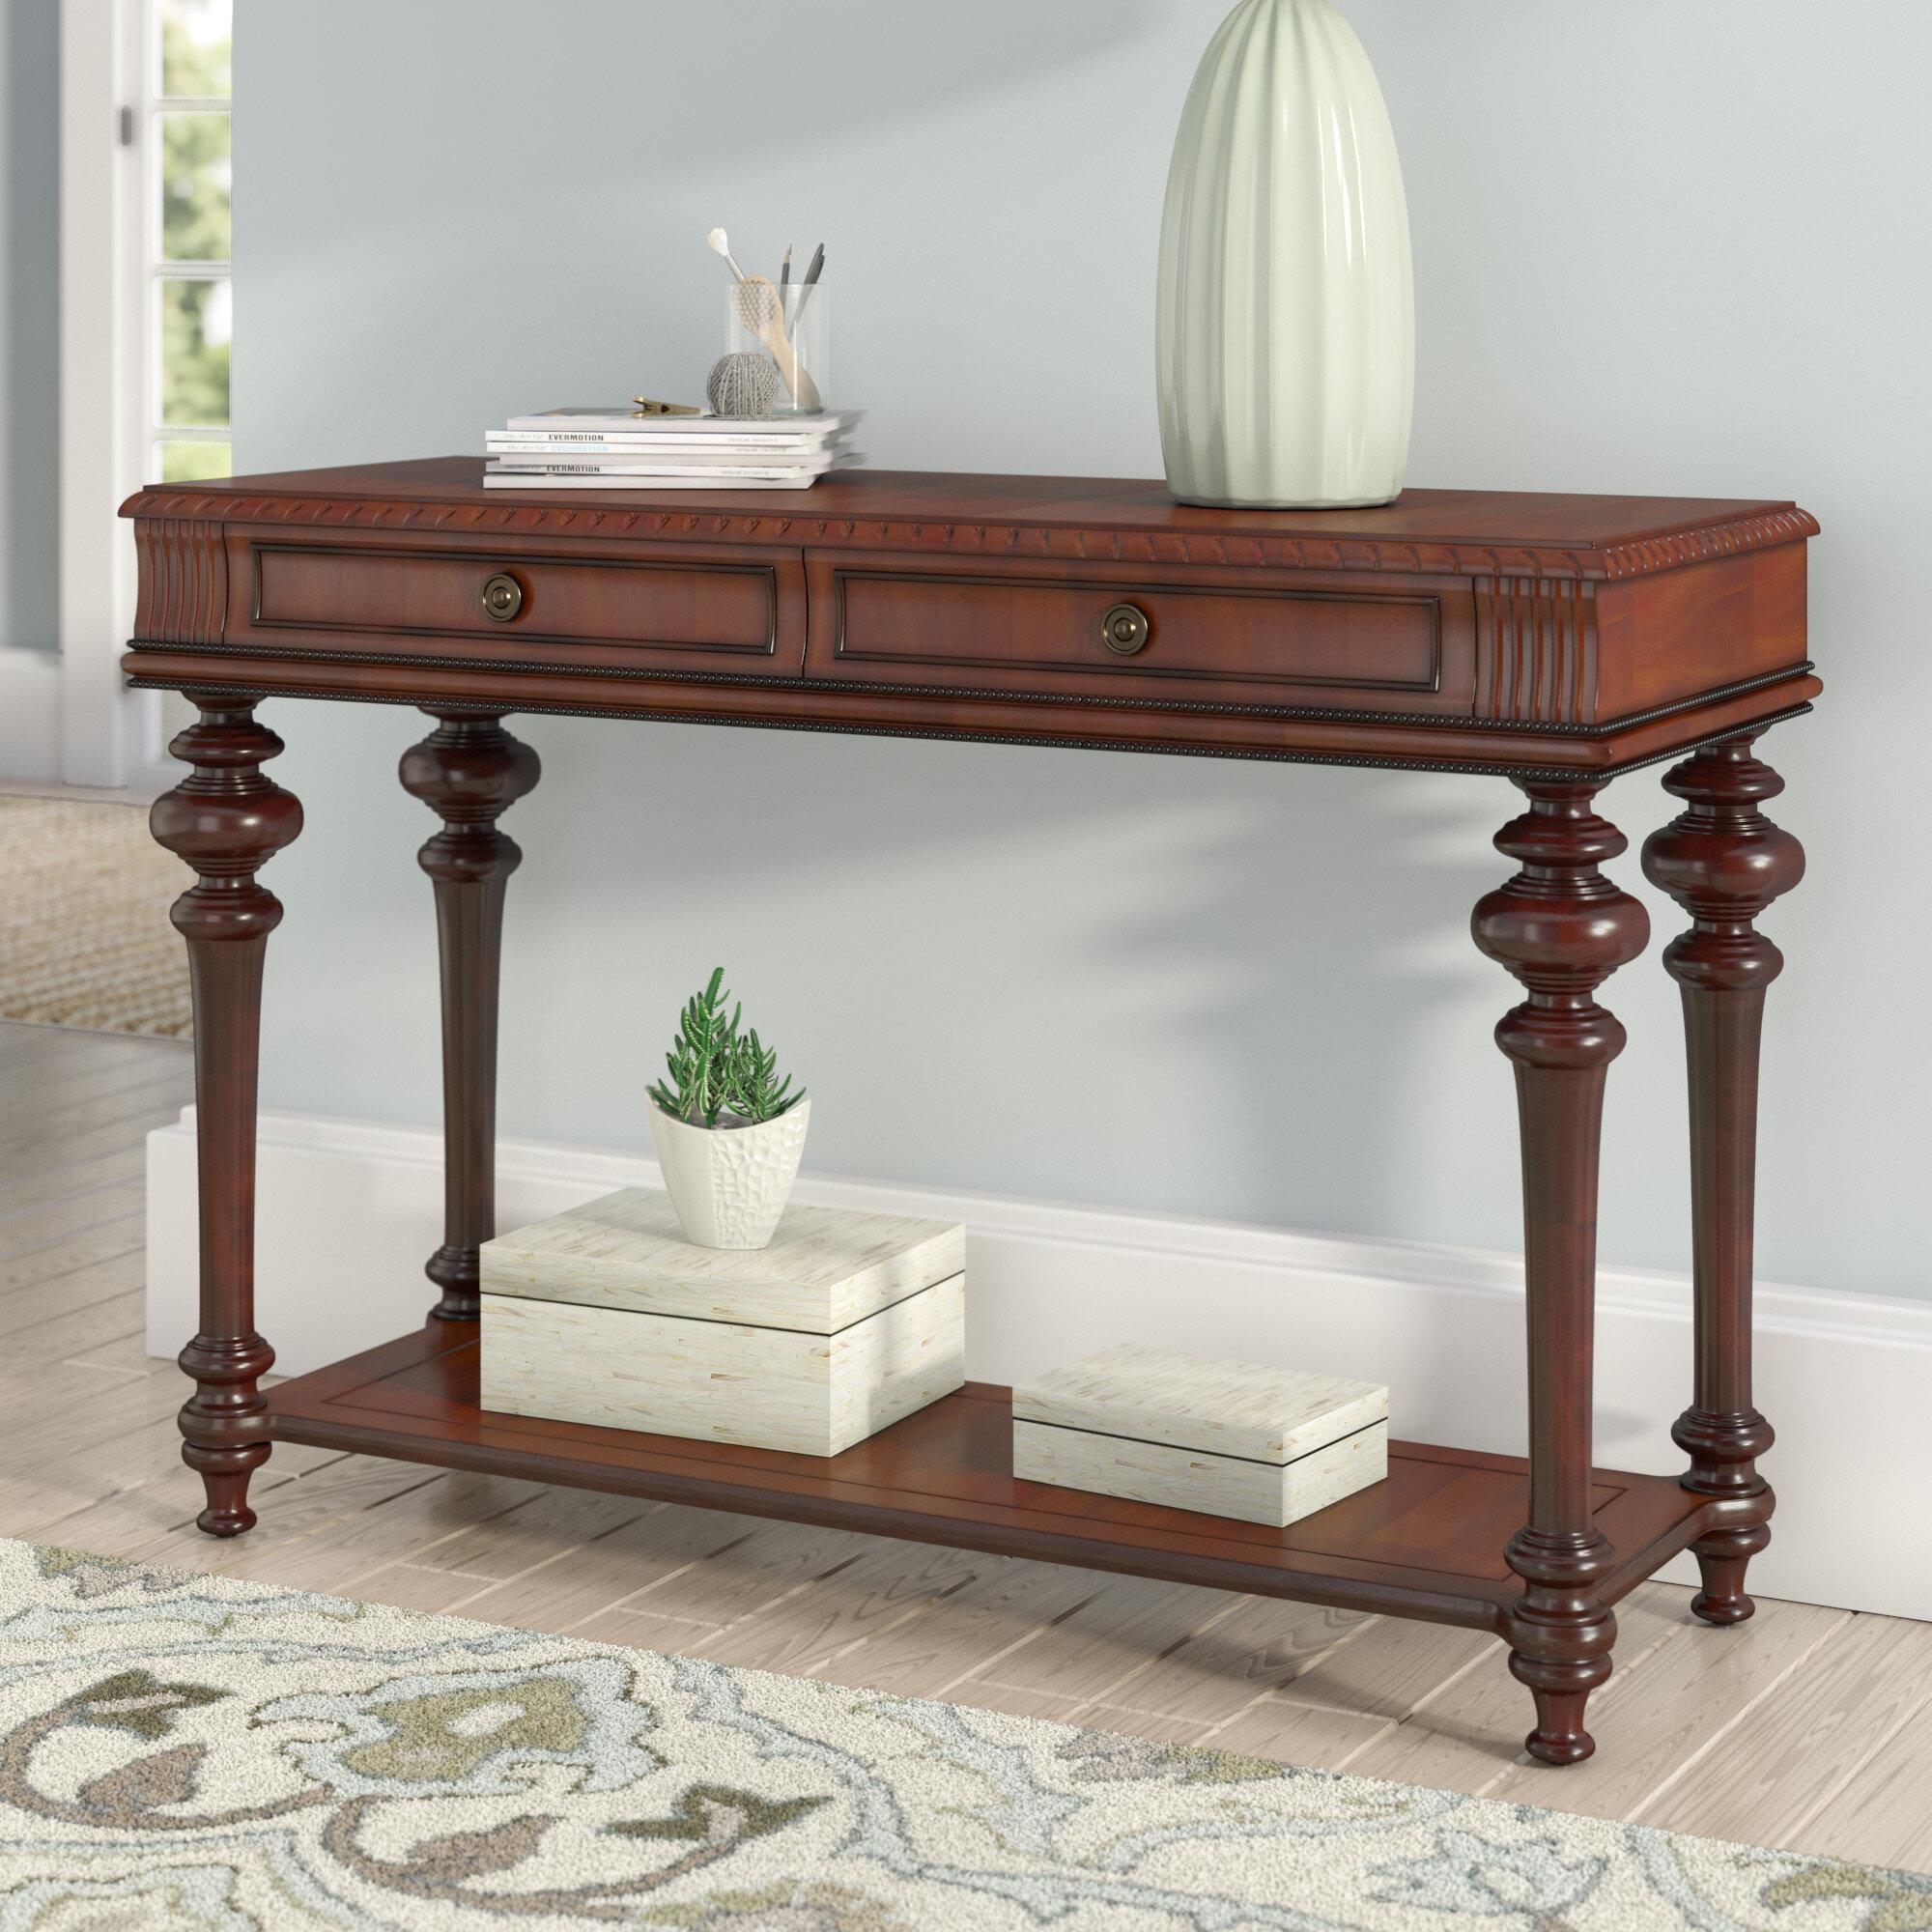 Astoria grand turnham console table reviews wayfair